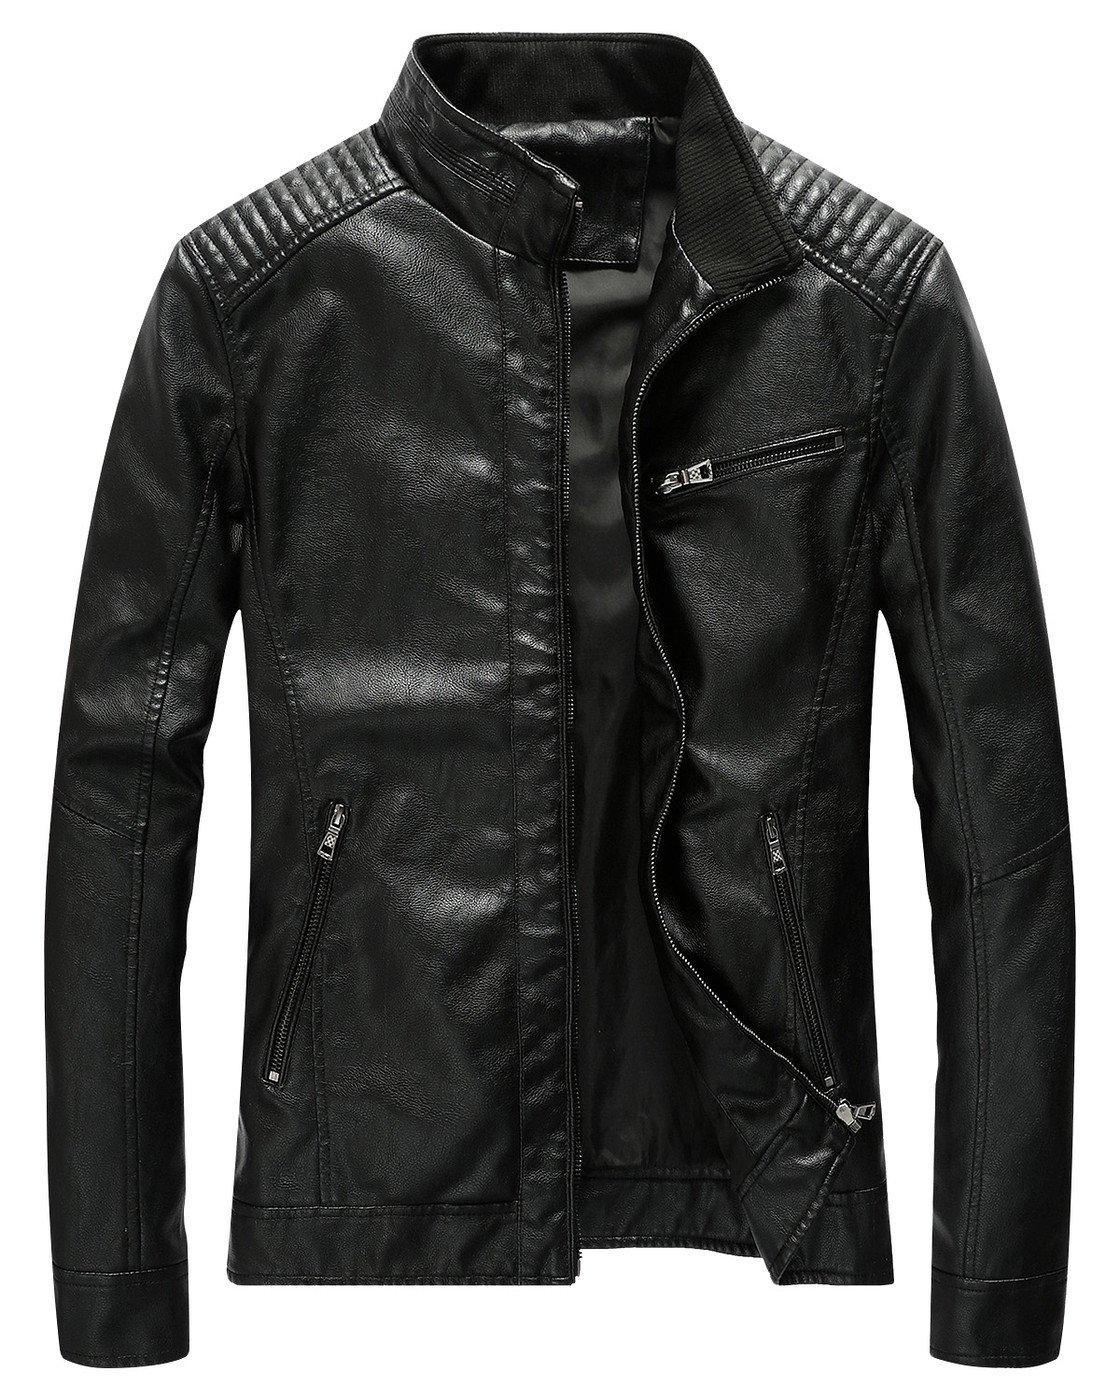 Fairylinks Leather Jacket Men Slim Fit Motorcyle Lightweight ,Black,Medium by Fairylinks